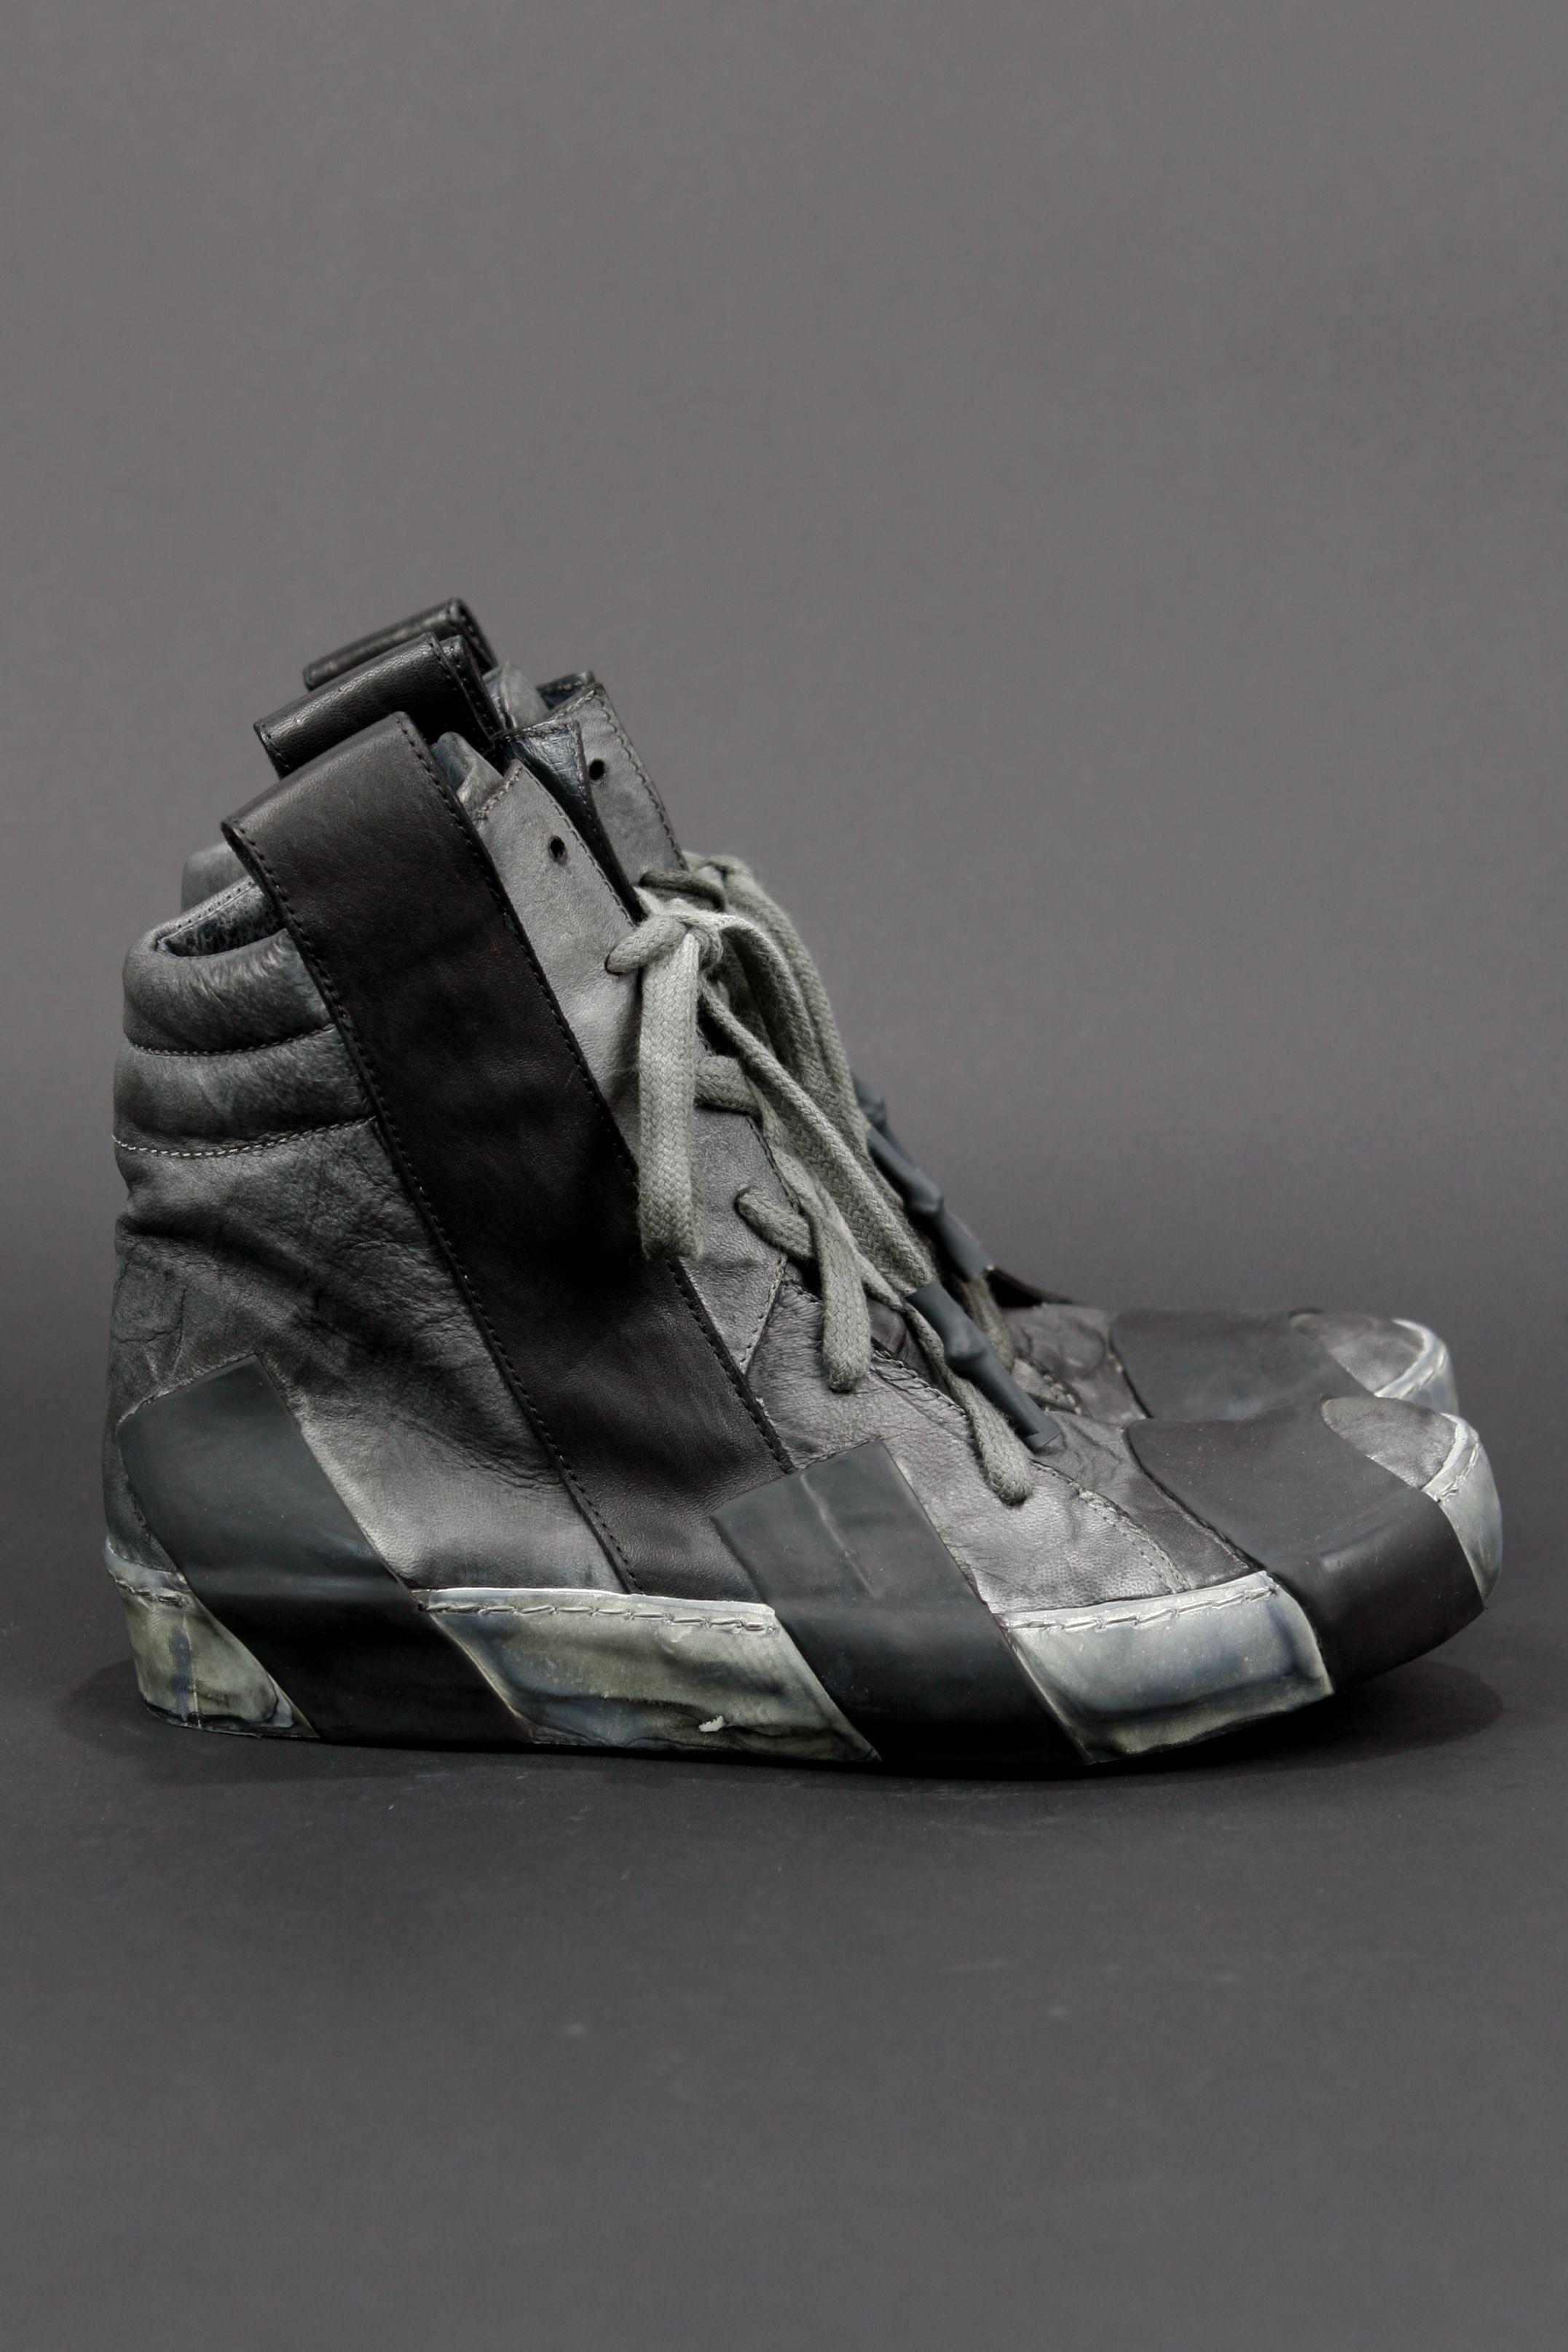 Buy Boris Bidjan Saberi Shoes online: Shop Man Shoes by